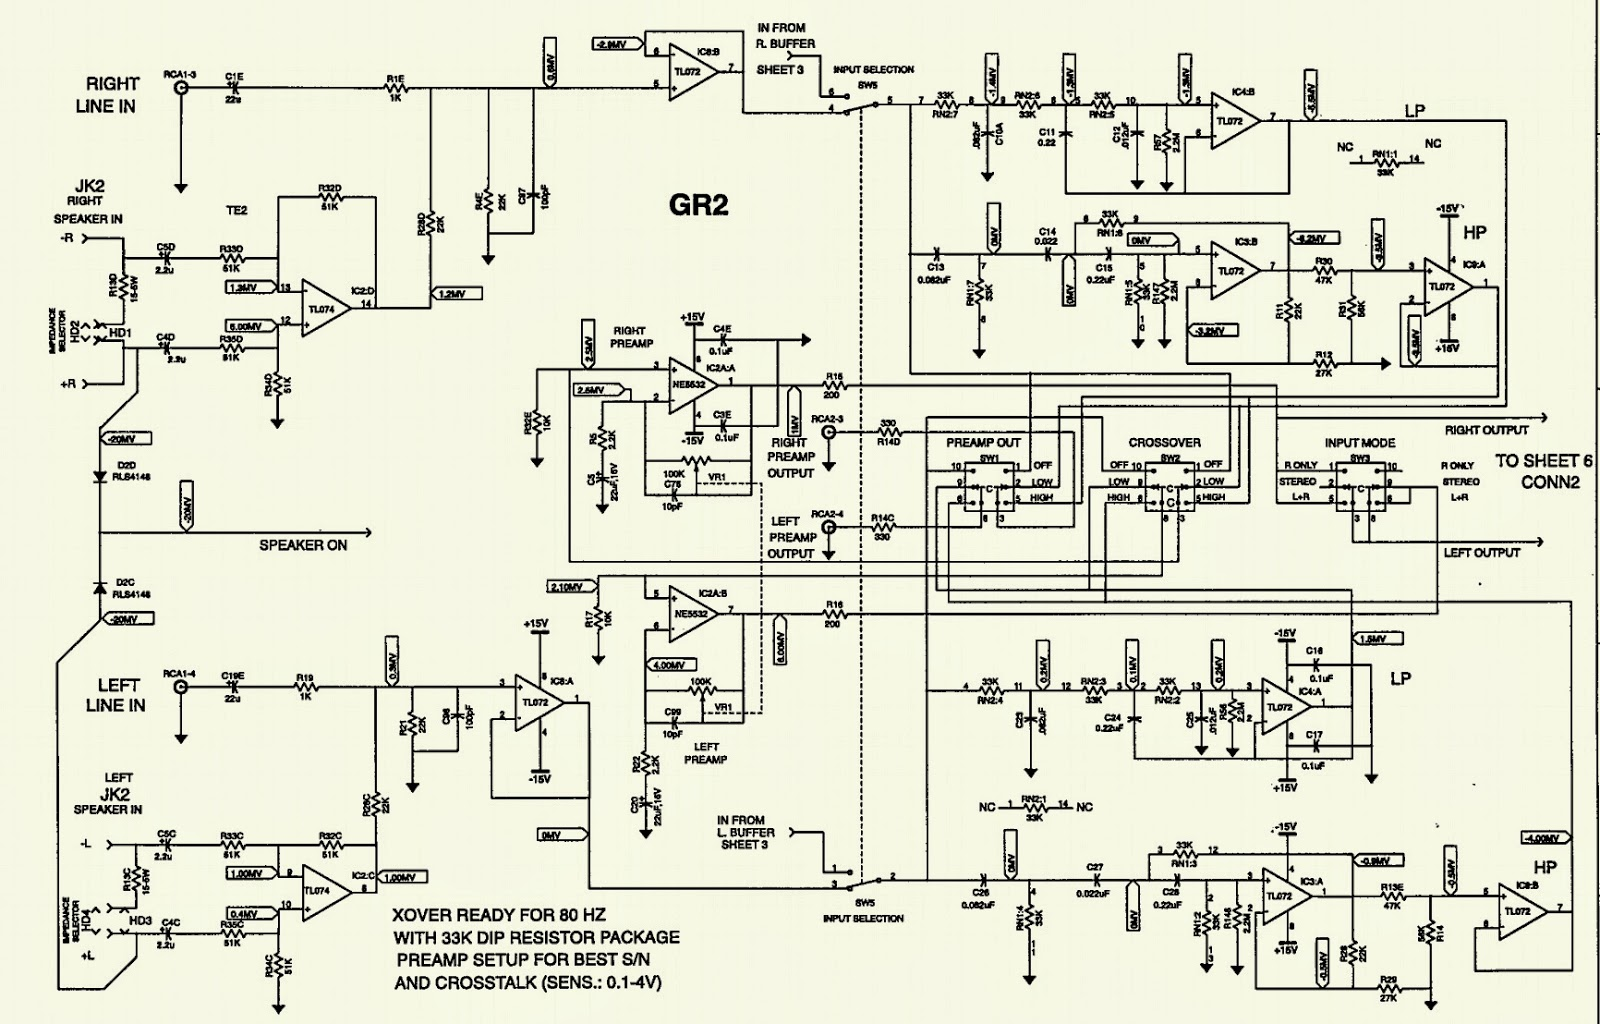 Jbl jtq360 car audio schematic circuit diagram electro help pre amp crossover schematic sciox Choice Image